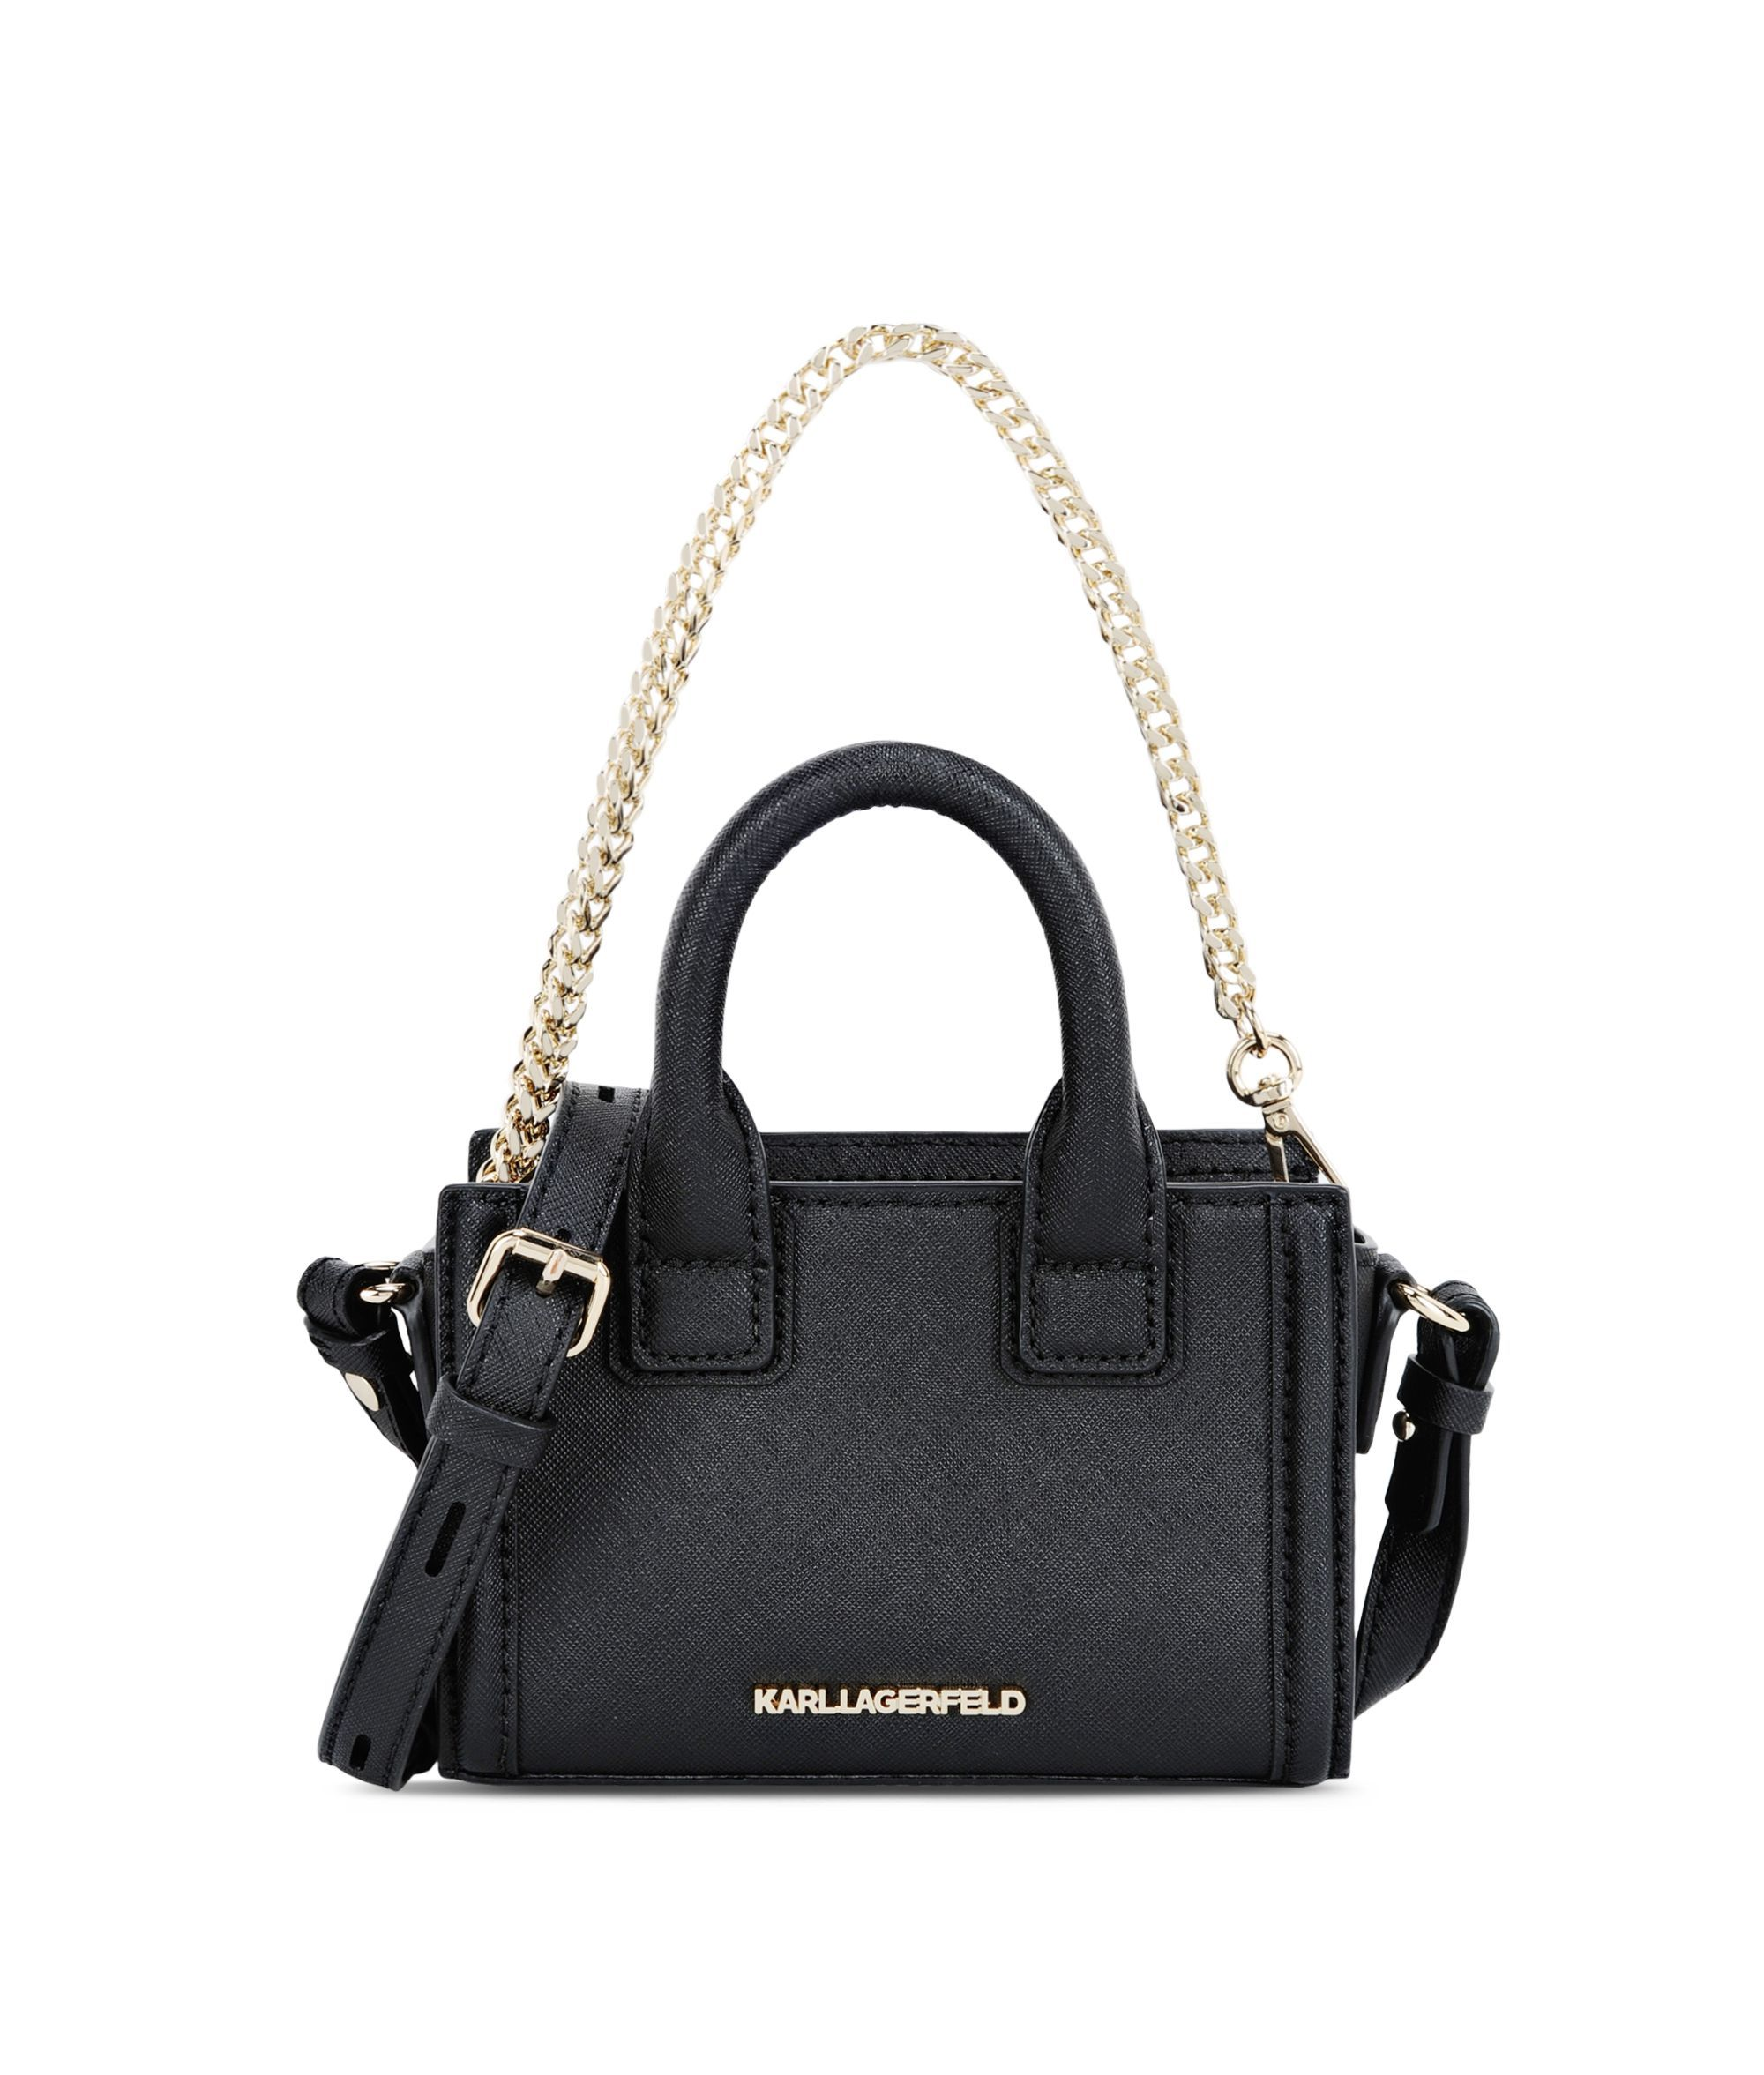 K Klassik Micro Tote Karl Lagerfeld Collections By Karl Lagerfeld Karl Com Bags Karl Lagerfeld Handbags Crossbody Bag